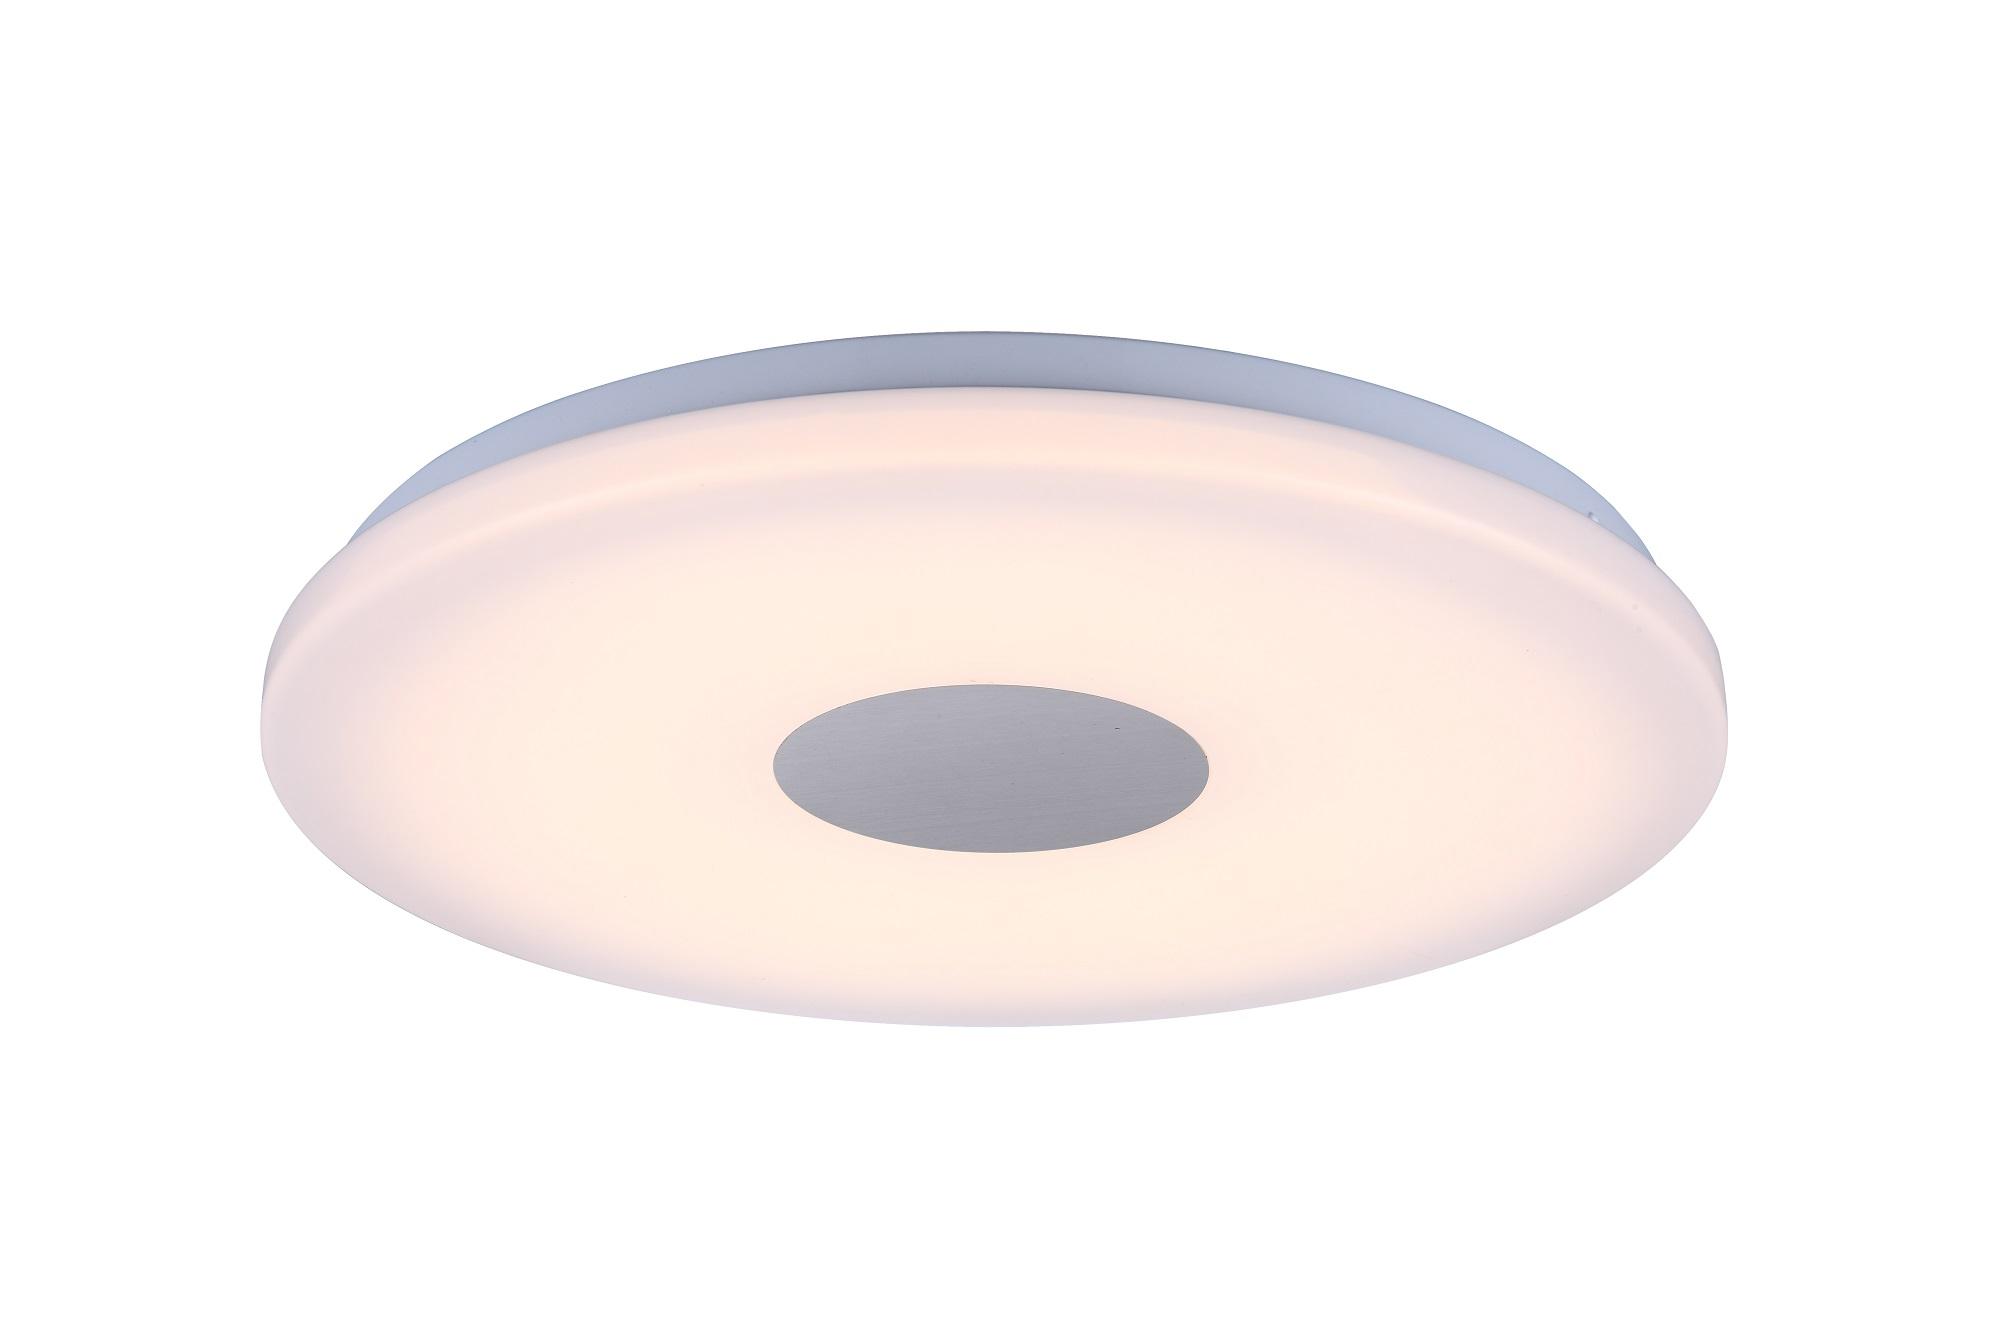 Светильник настенно-потолочныйПотолочные светильники<br>&amp;lt;div&amp;gt;Вид цоколя: LED&amp;lt;/div&amp;gt;&amp;lt;div&amp;gt;Мощность: 18W&amp;lt;/div&amp;gt;&amp;lt;div&amp;gt;Количество ламп: 1&amp;lt;/div&amp;gt;&amp;lt;div&amp;gt;&amp;lt;br&amp;gt;&amp;lt;/div&amp;gt;&amp;lt;div&amp;gt;Материал: металл, акрил&amp;lt;/div&amp;gt;<br><br>Material: Металл<br>Высота см: 5